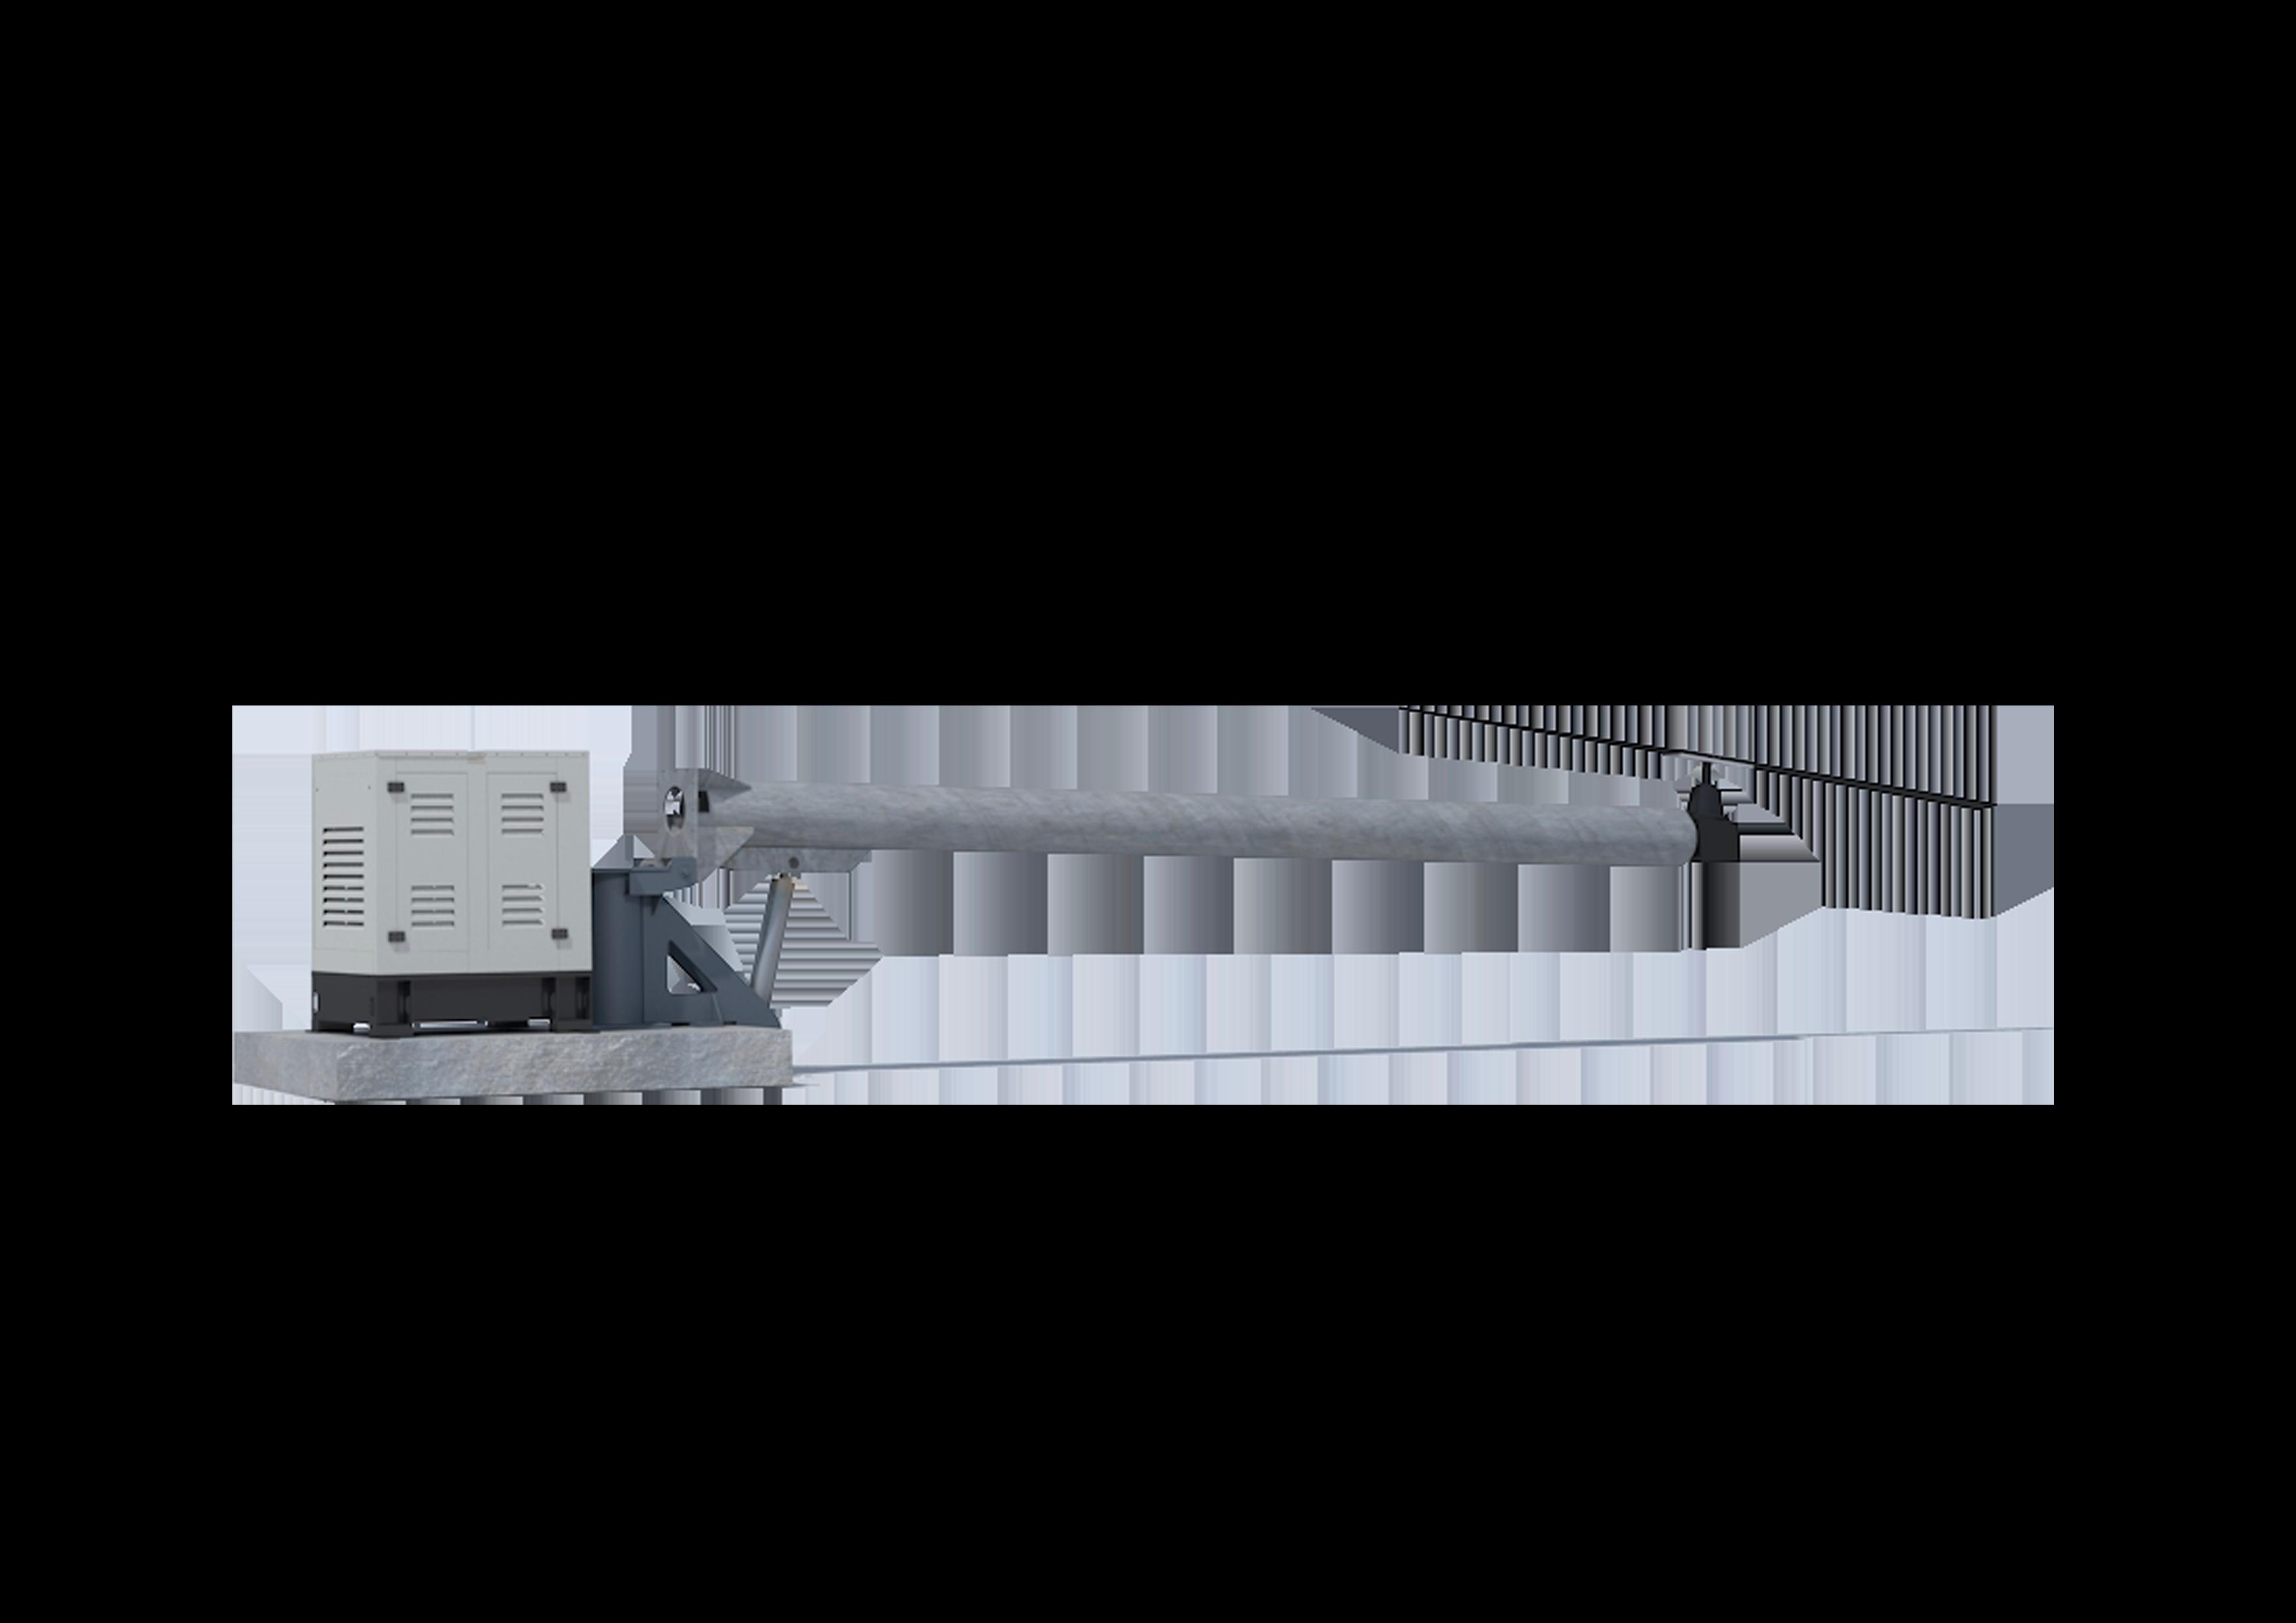 S-60R